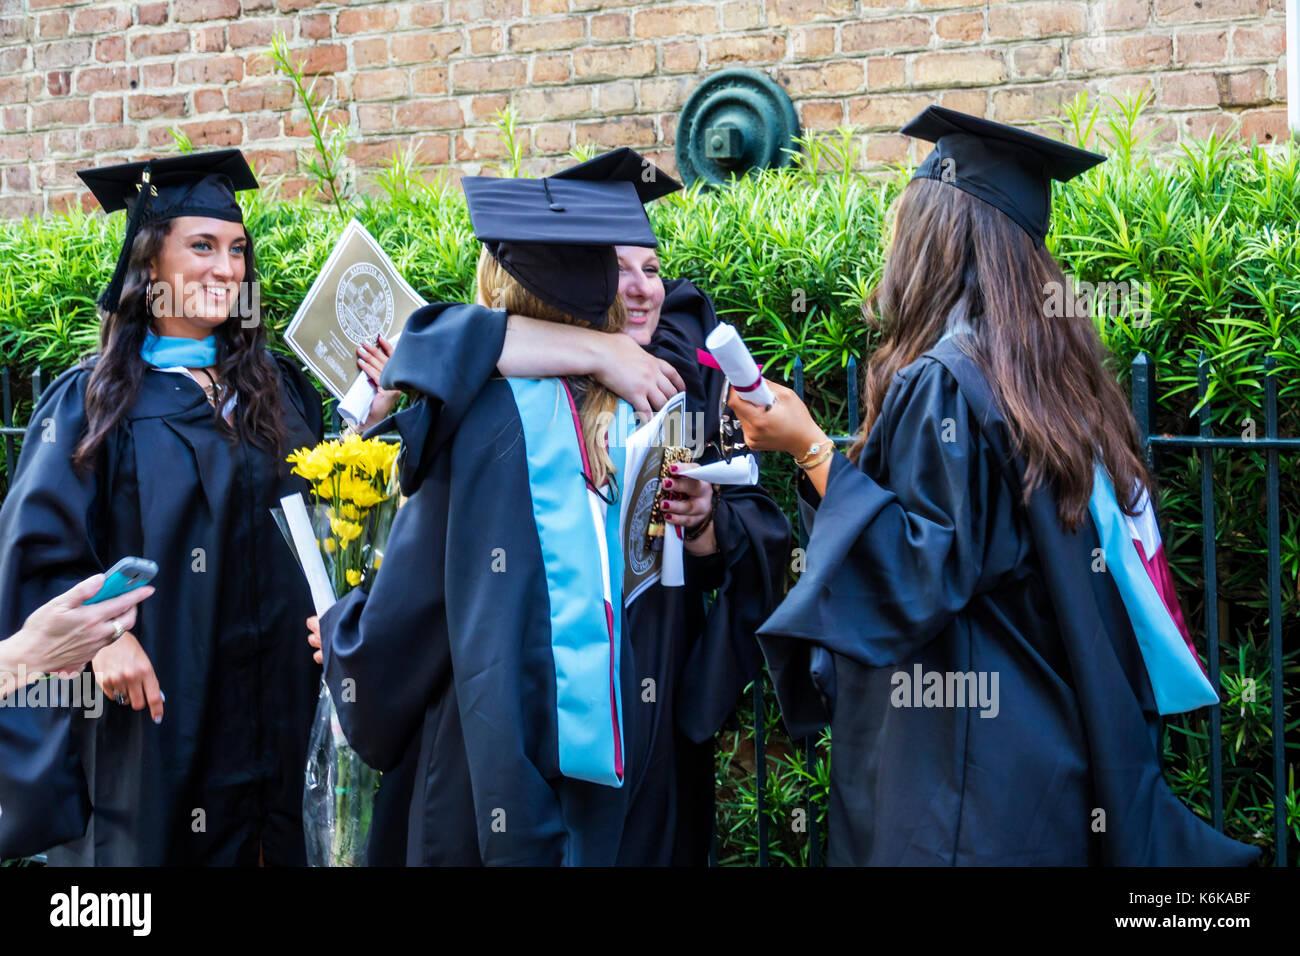 Charleston South Carolina SC College of Charleston university graduation ceremony commencement student hugging celebrating - Stock Image